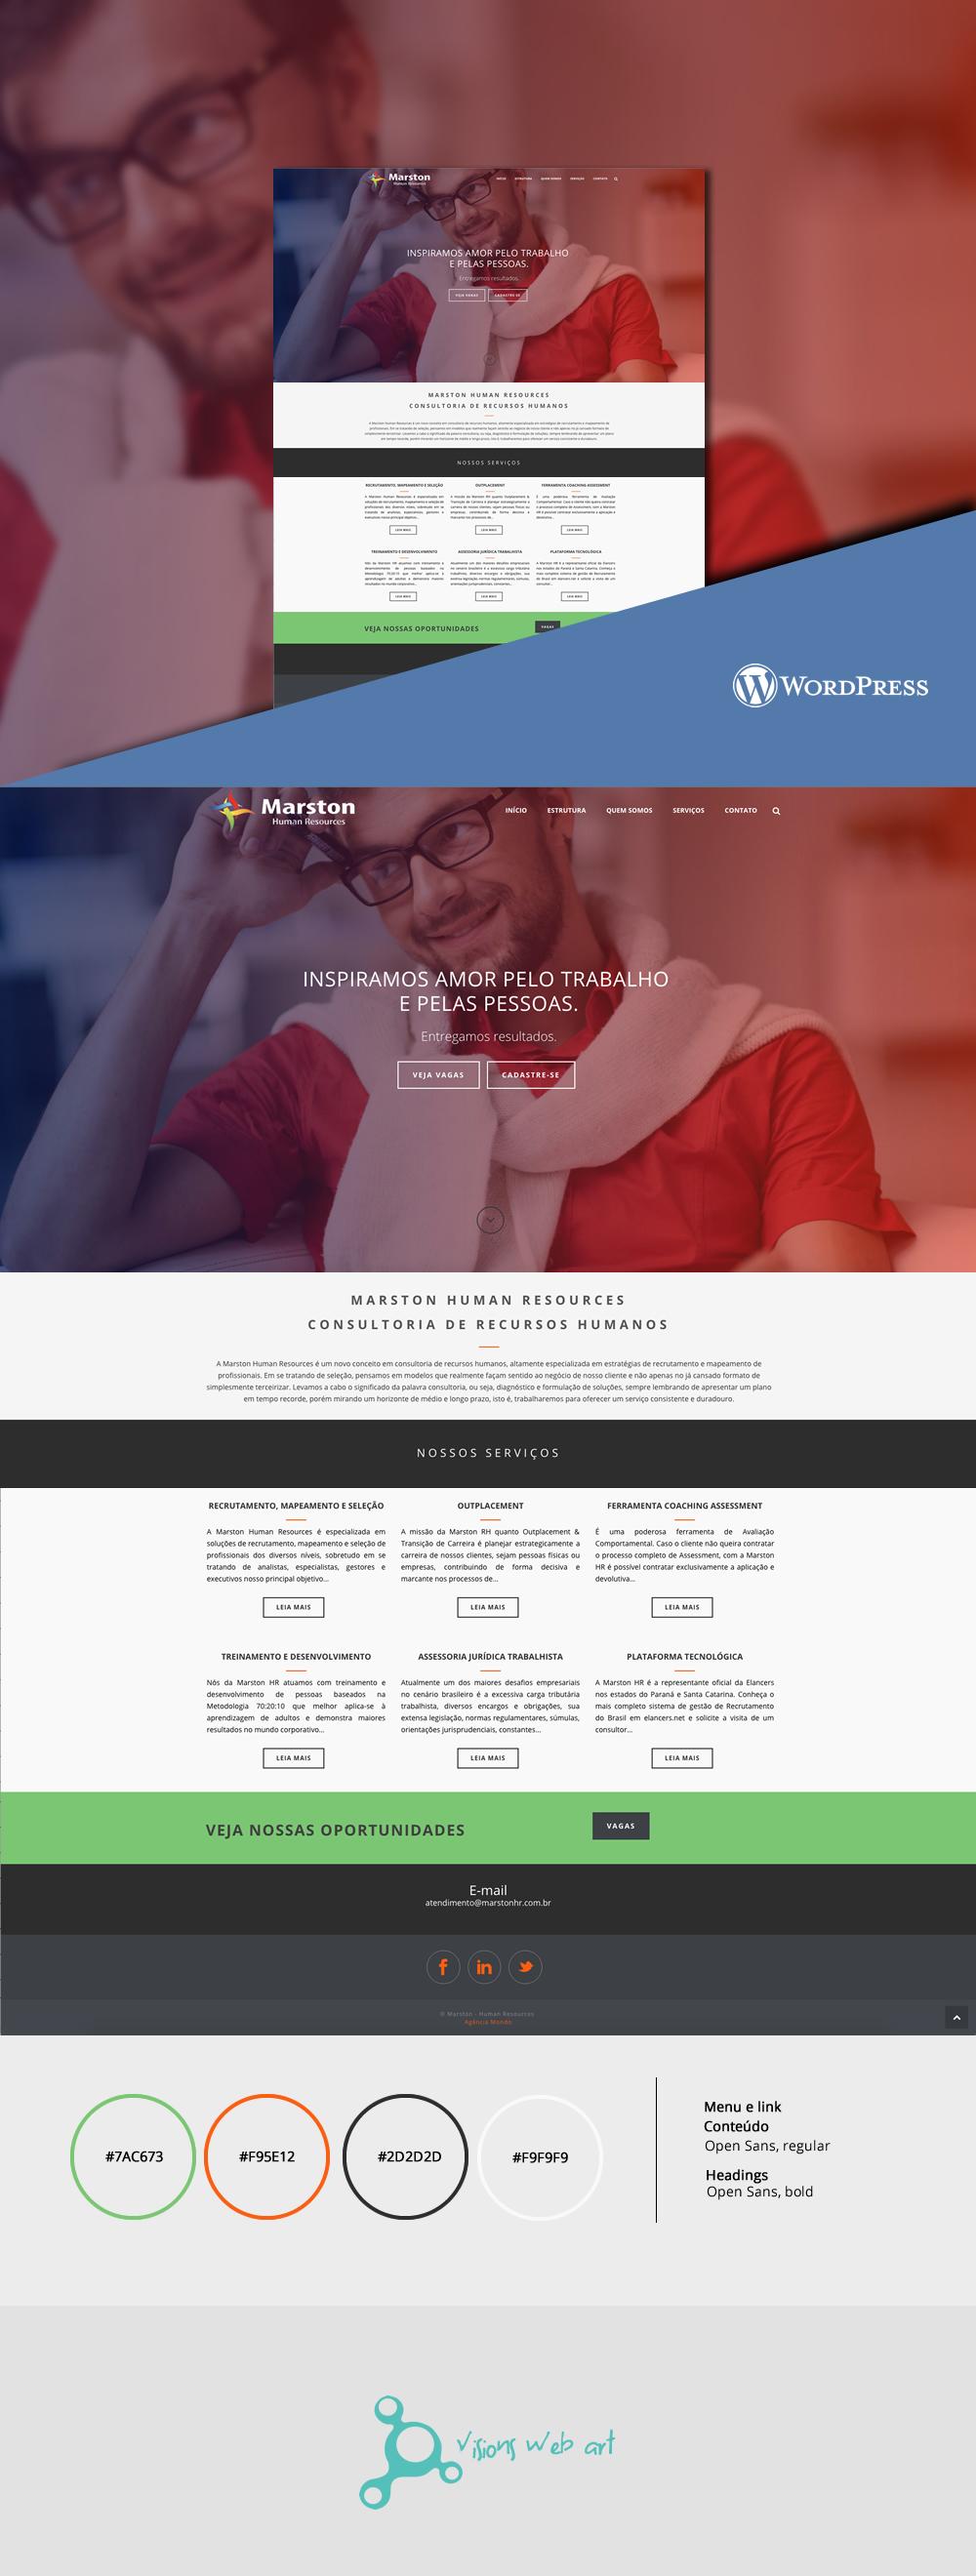 wordpress wp Responsive ux UI blue design Web designer site